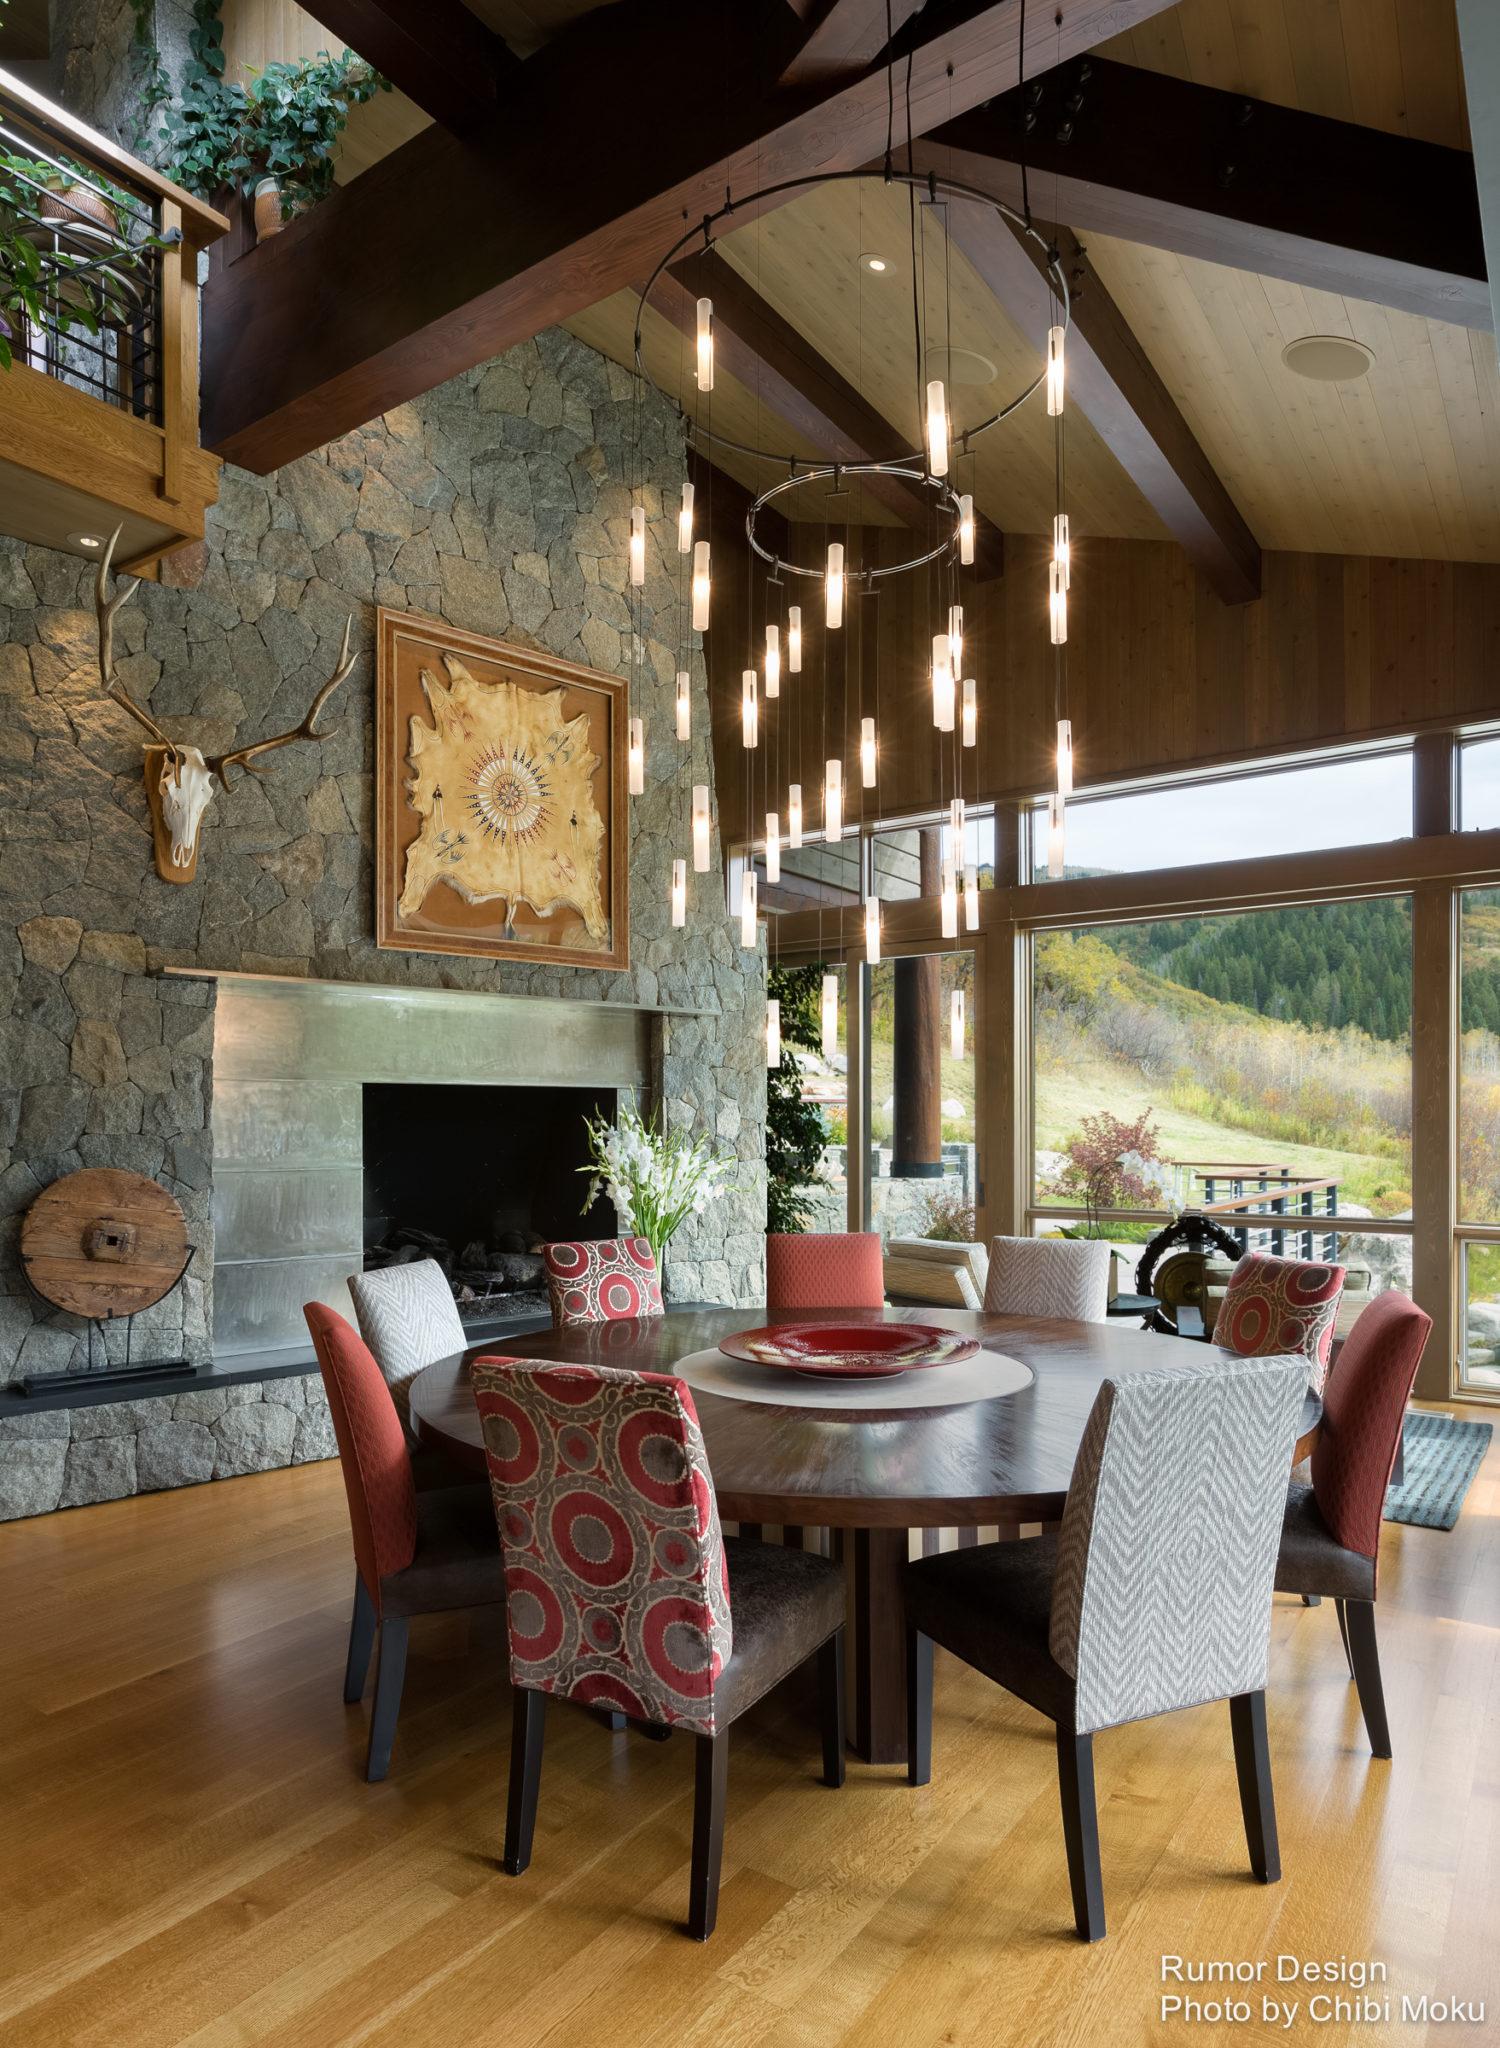 Rumor Design Graystone Canyon Steamboat Springs CO ArcDog